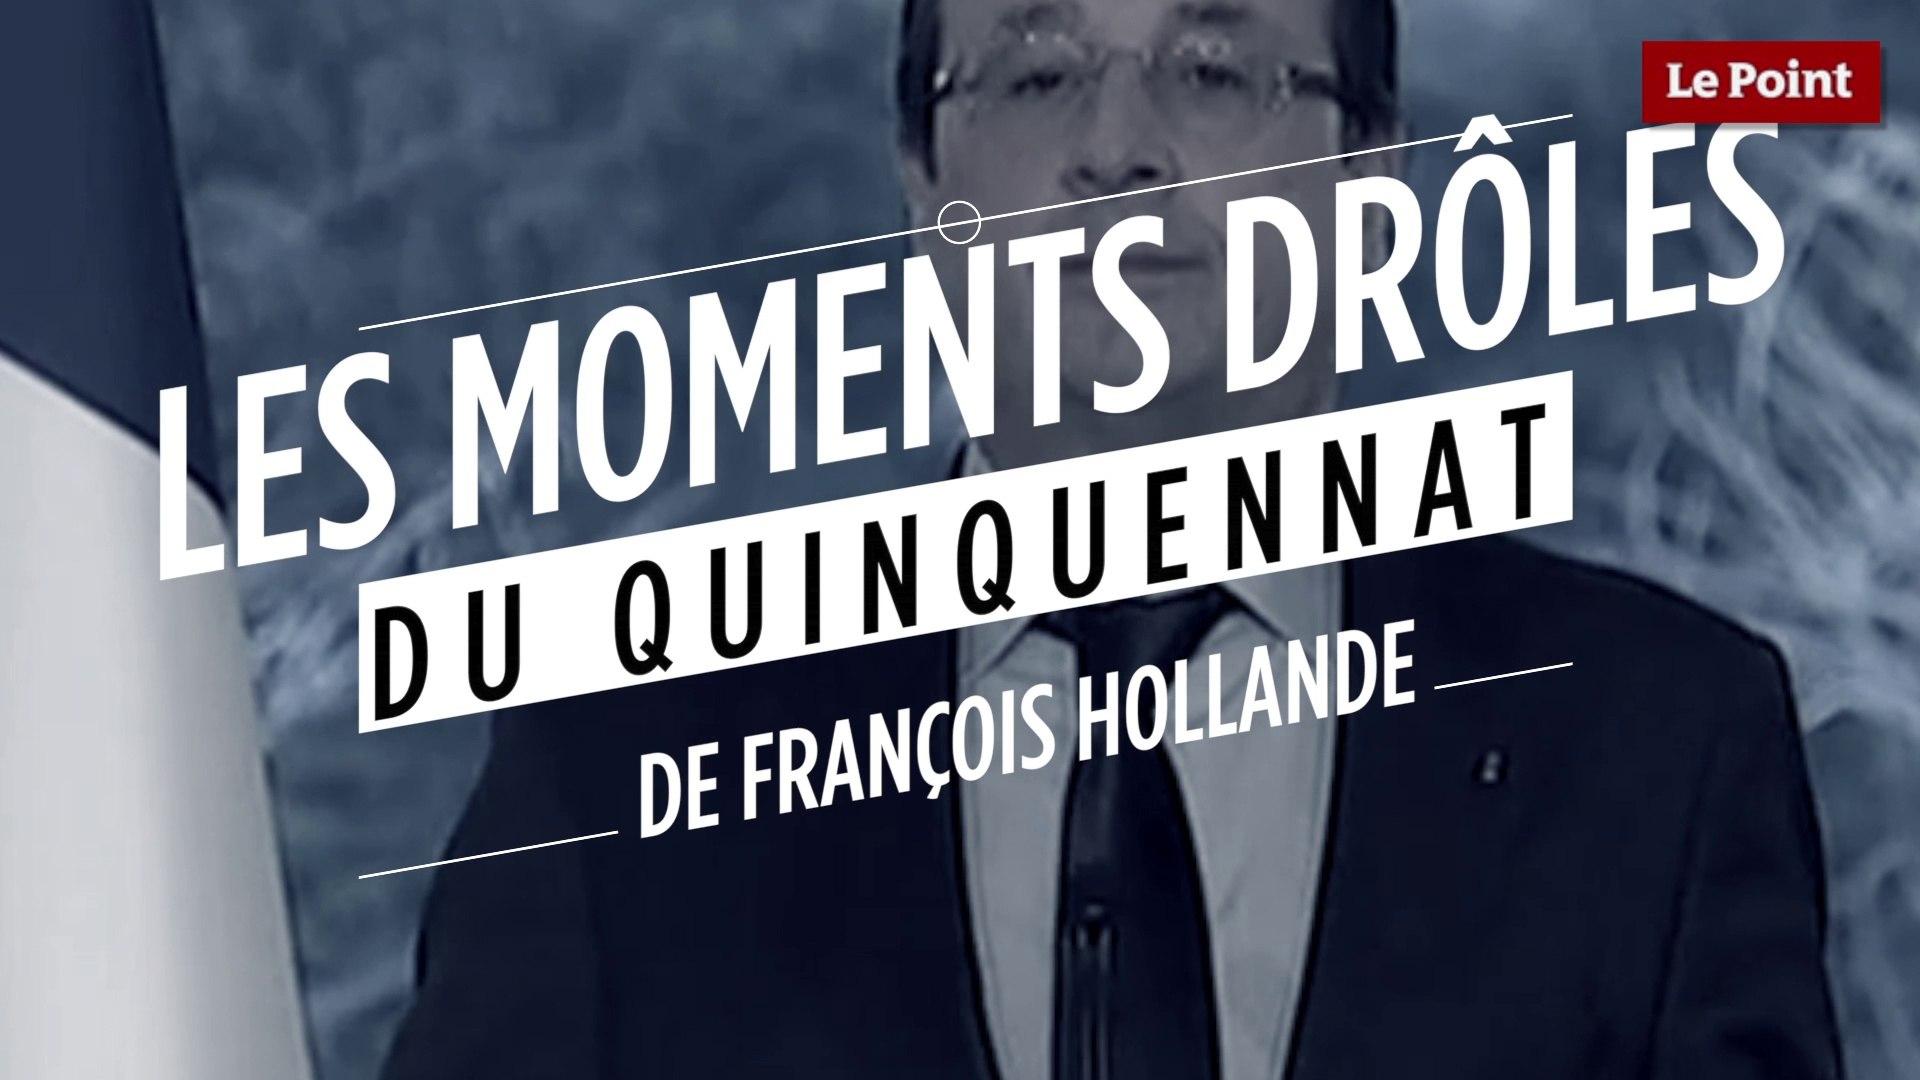 Les Moments Les Plus Droles Du Quinquennat De Francois Hollande Video Dailymotion